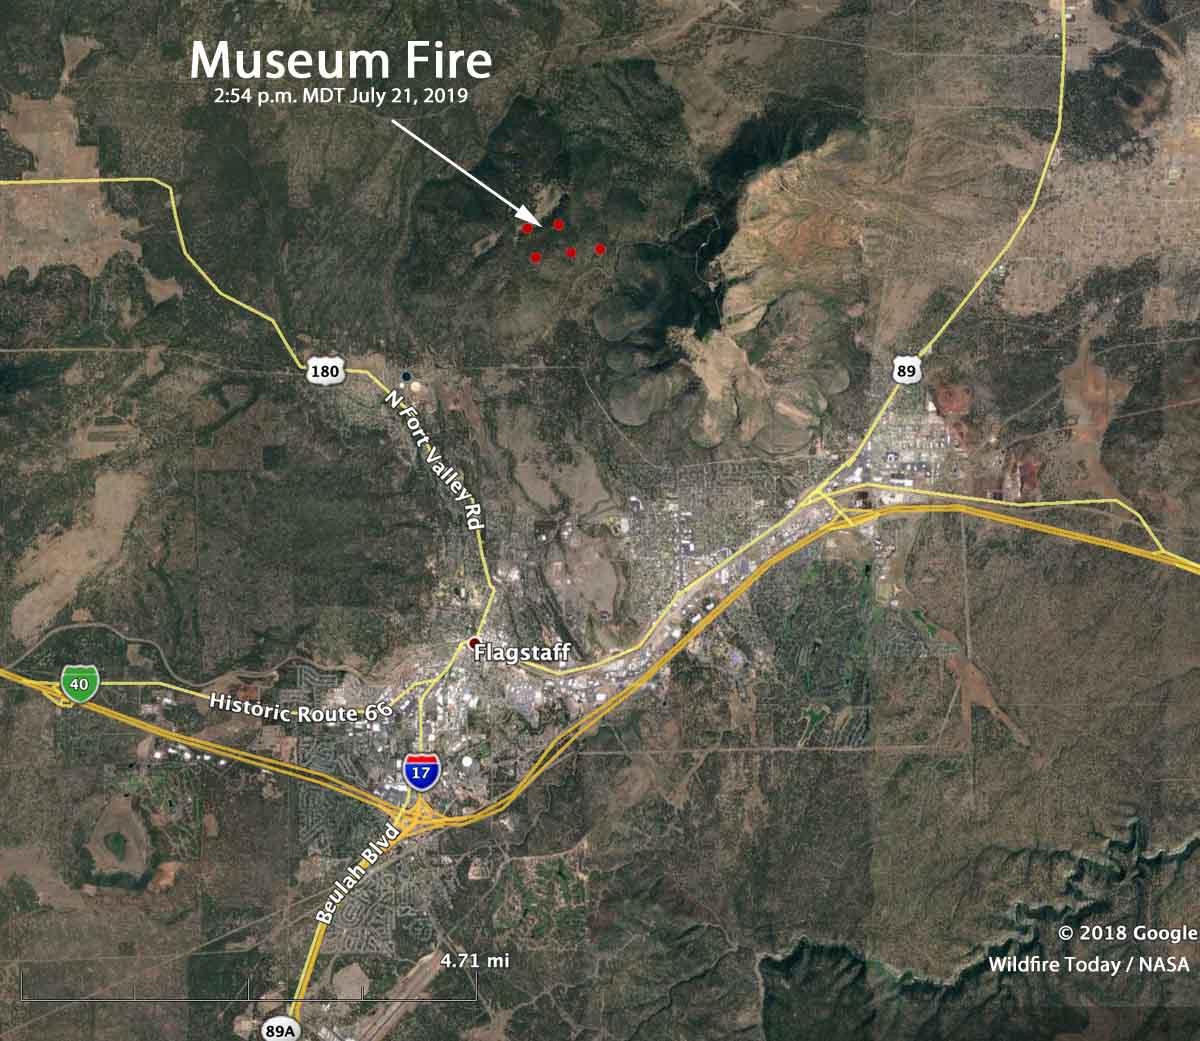 Map flagstaff arizona Museum Fire